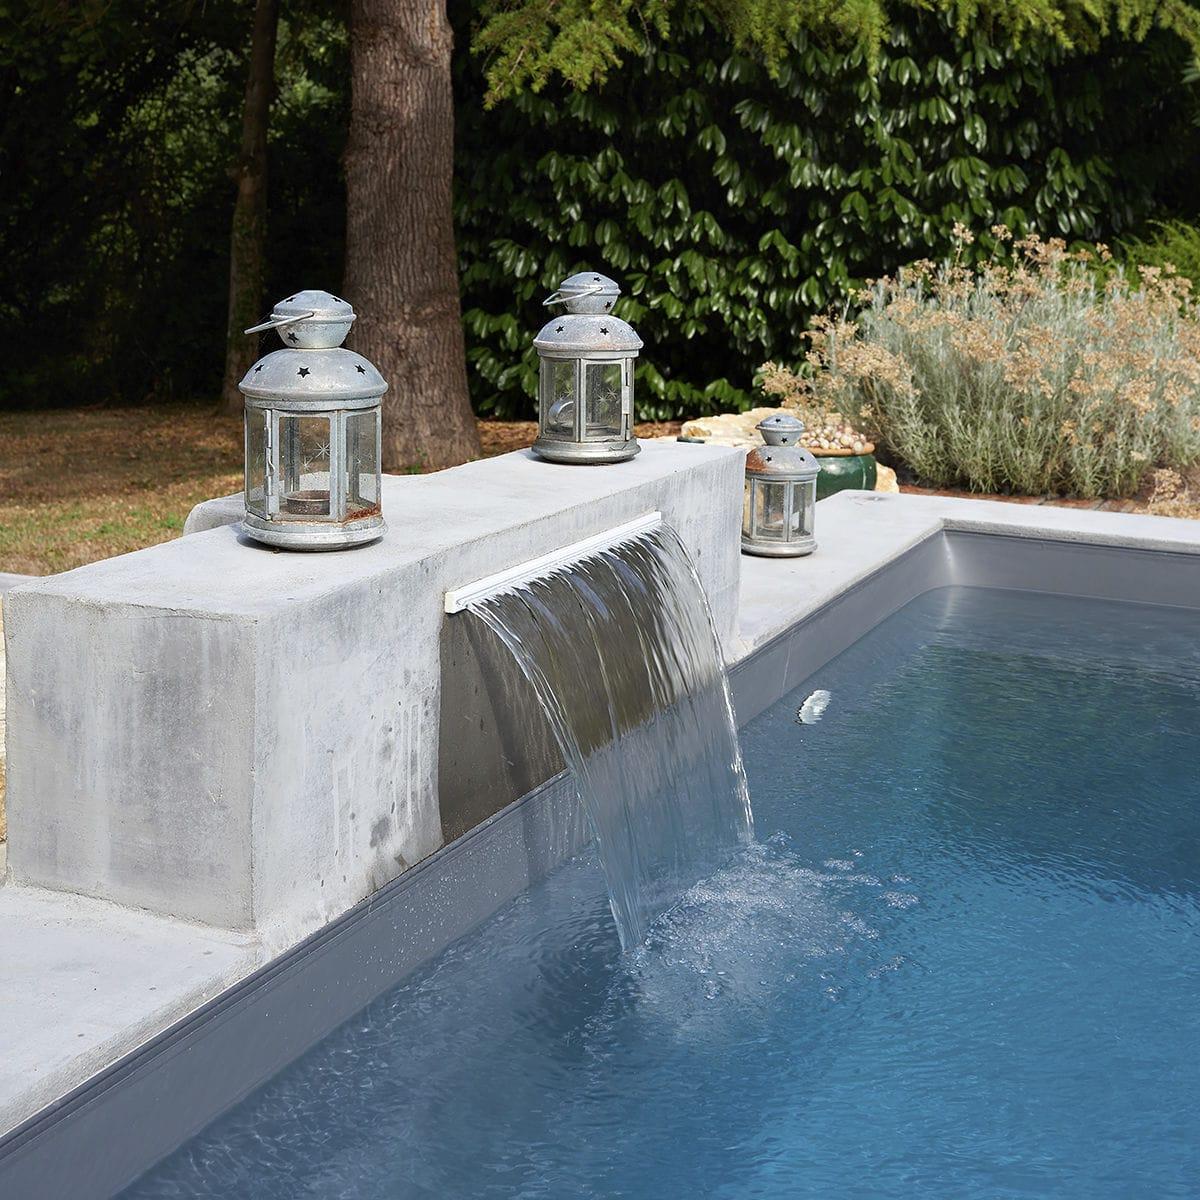 Swimming Pool Waterfall Lame D Eau Poitiers Piscines Carre Bleu